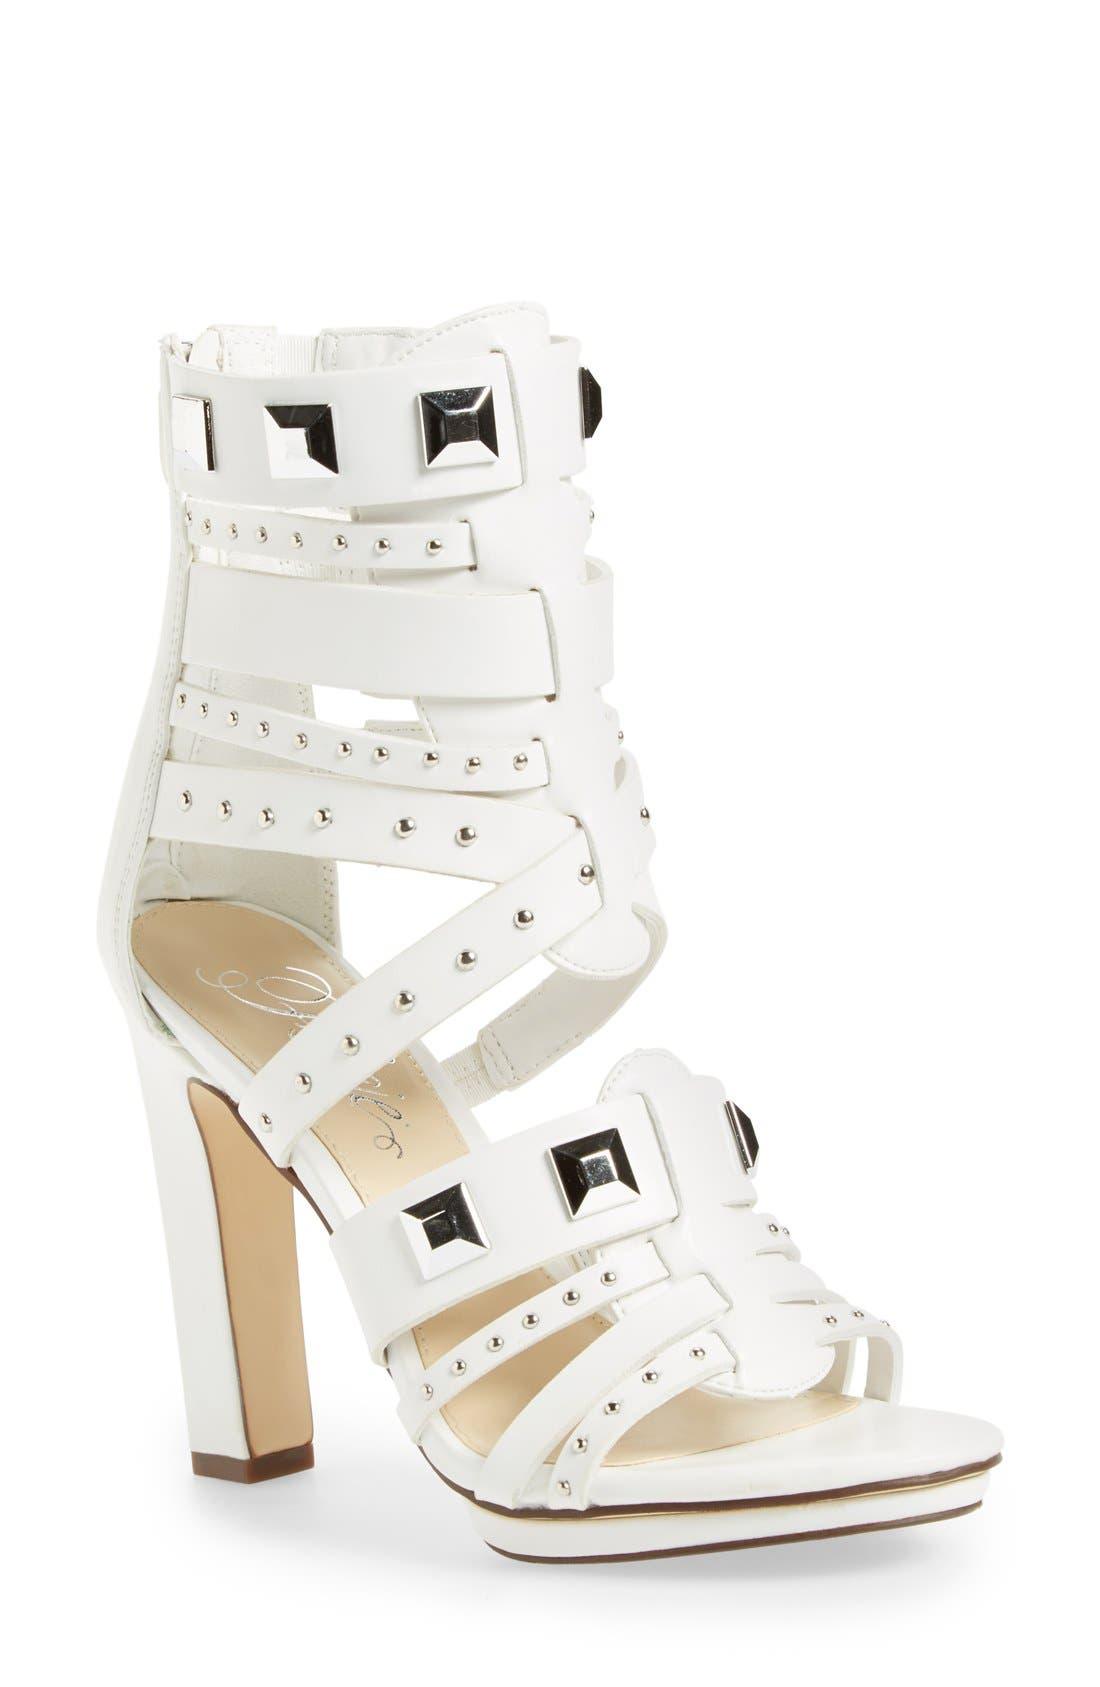 Main Image - Fergie 'Bonnie' Studded Strappy Sandal (Women)